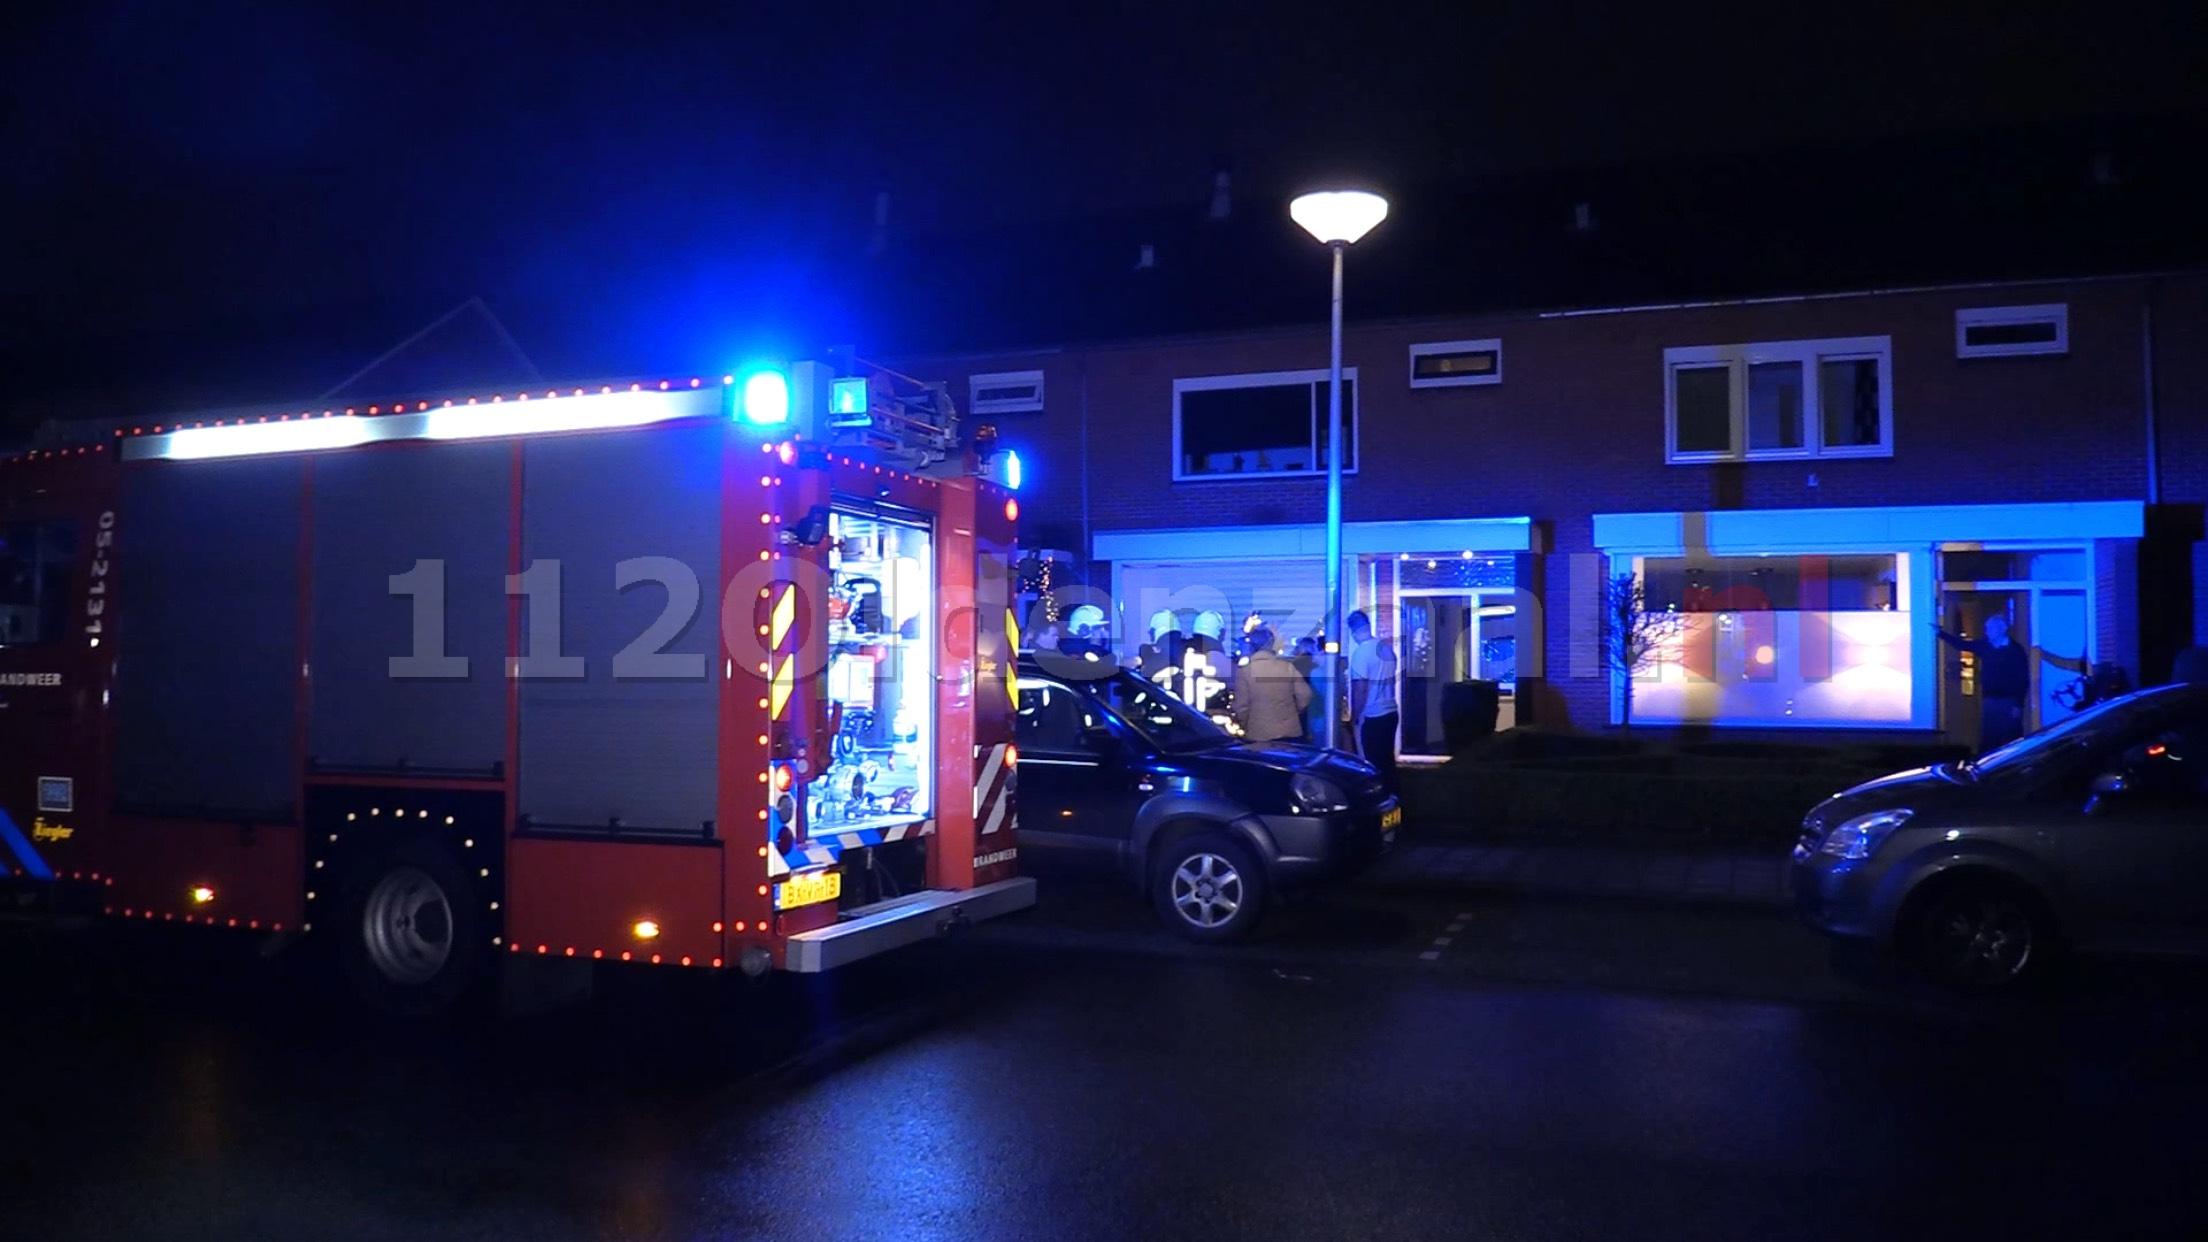 UPDATE (foto's): Brandweer rukt uit voor melding woningbrand Oldenzaal; woonkamer vol rook